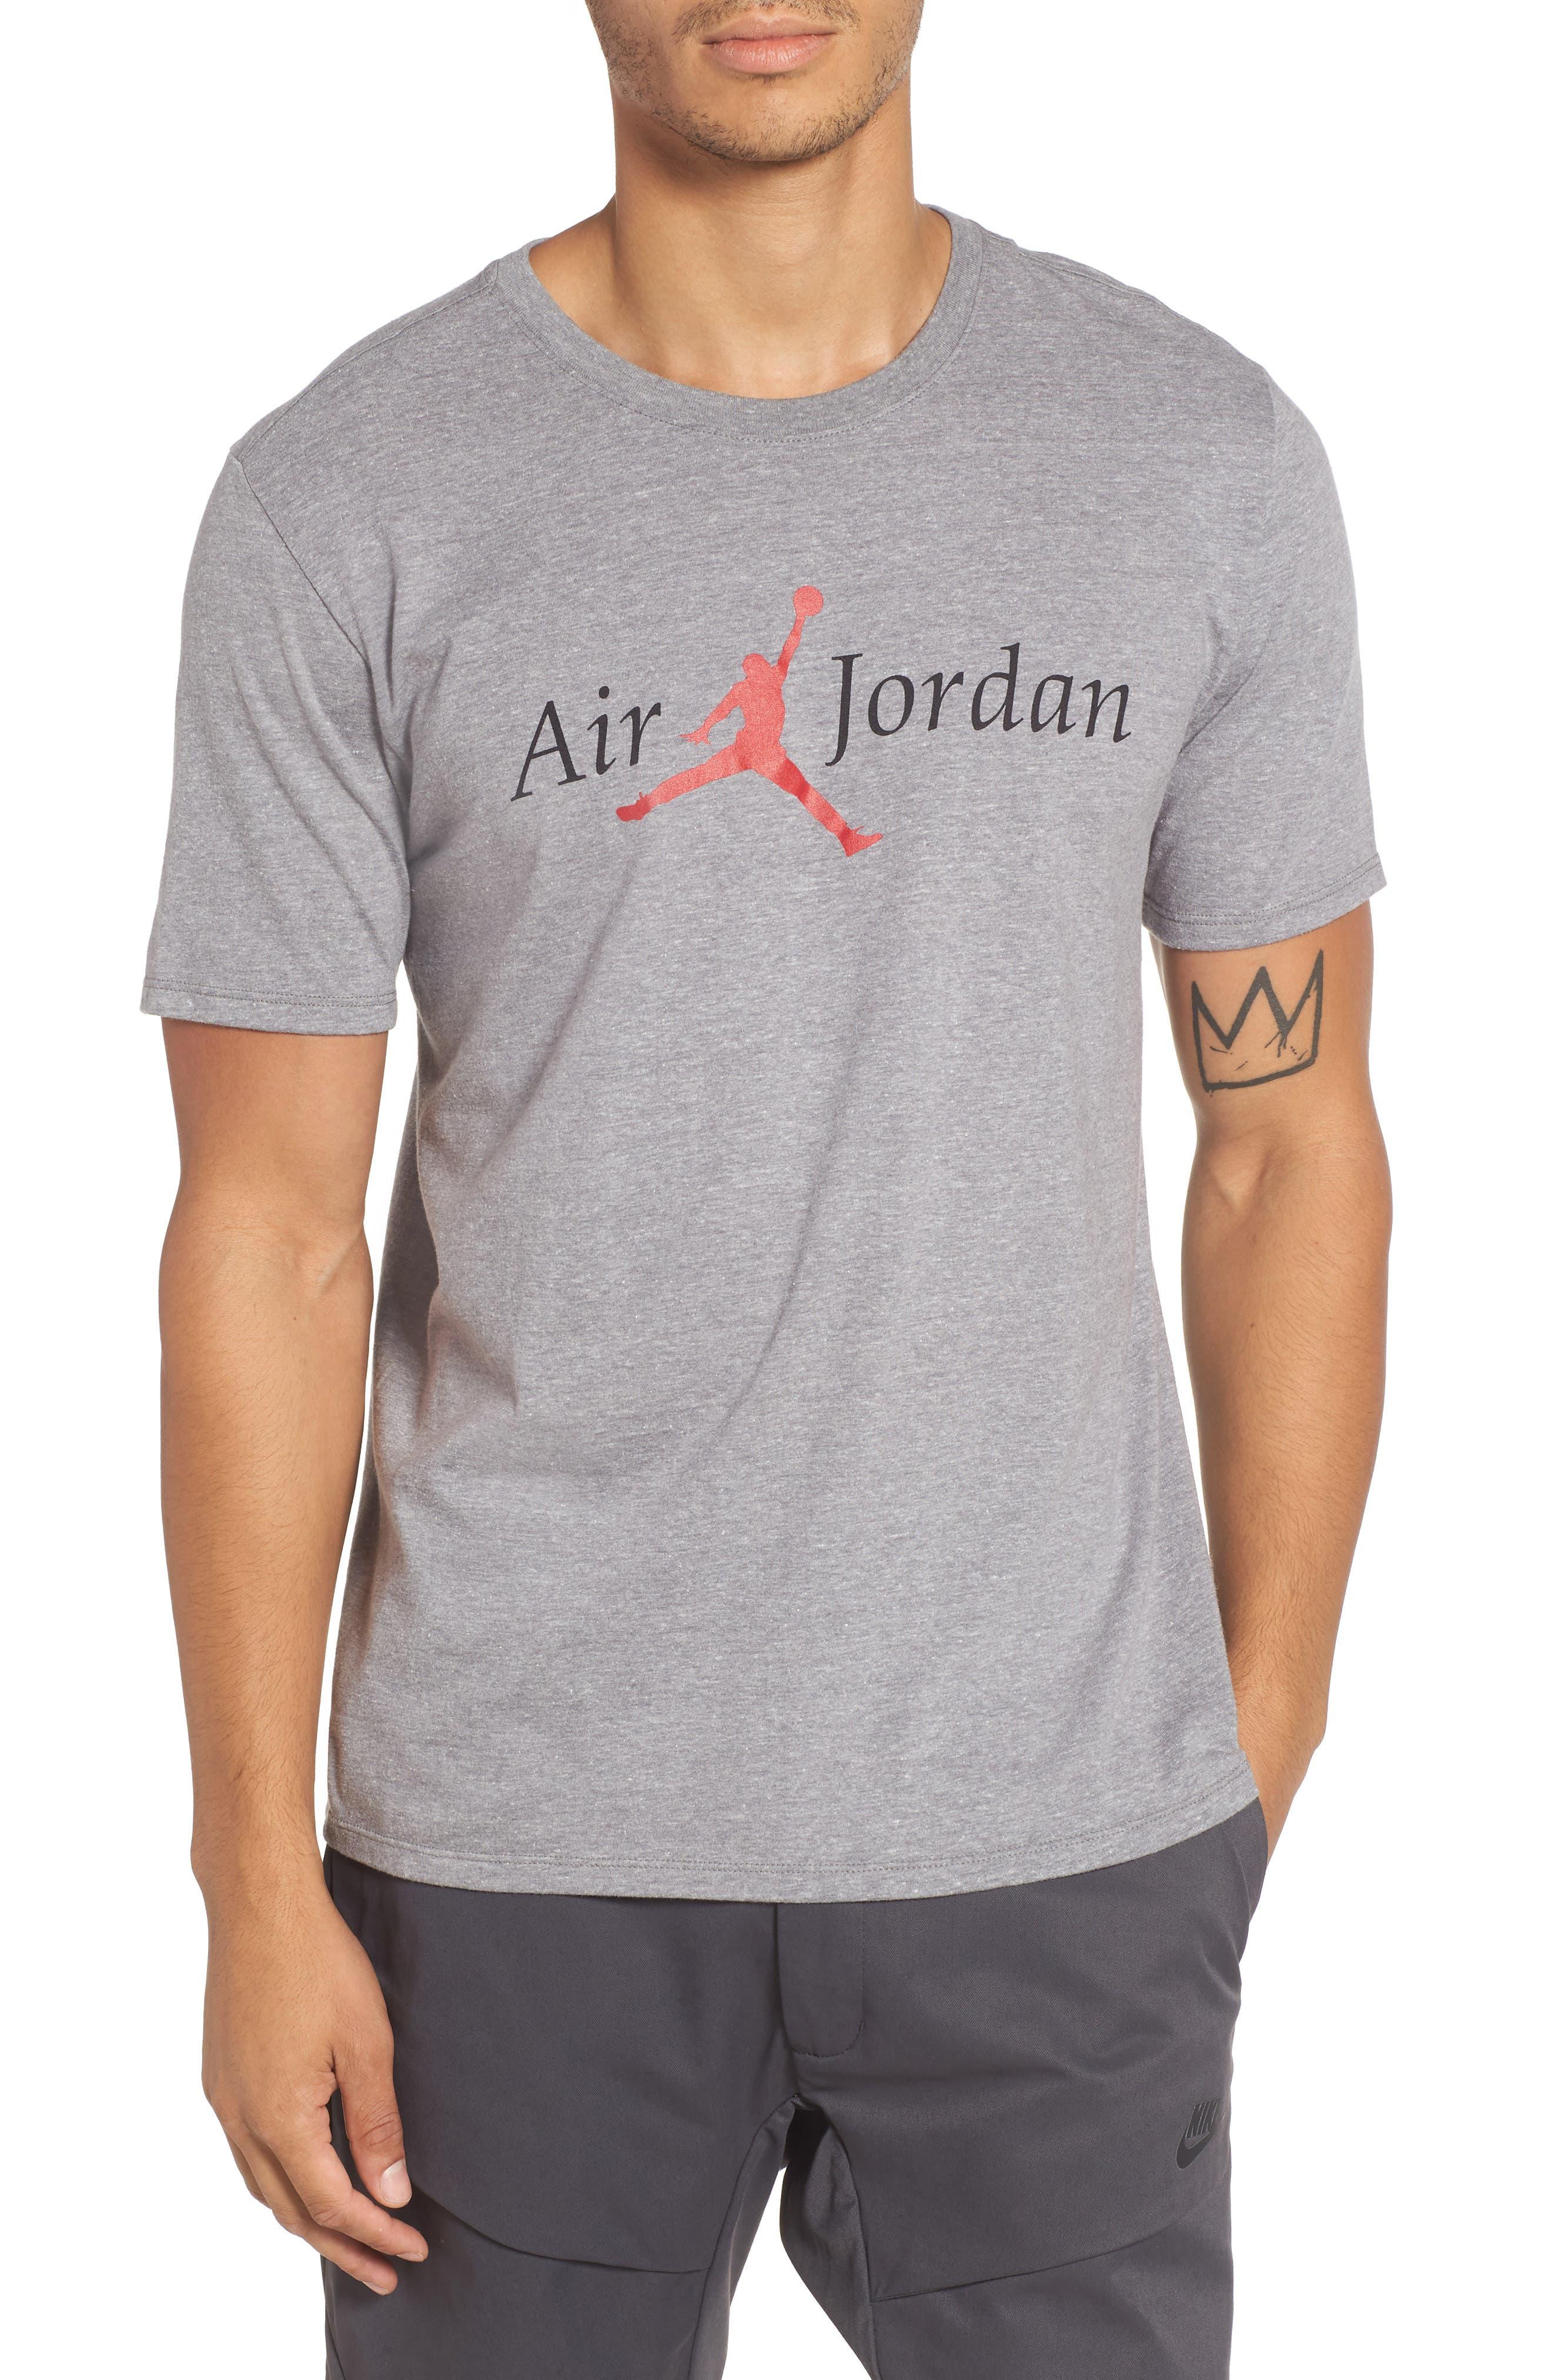 Nike Jordan Air Jordan 5 Graphic T-Shirt Grey